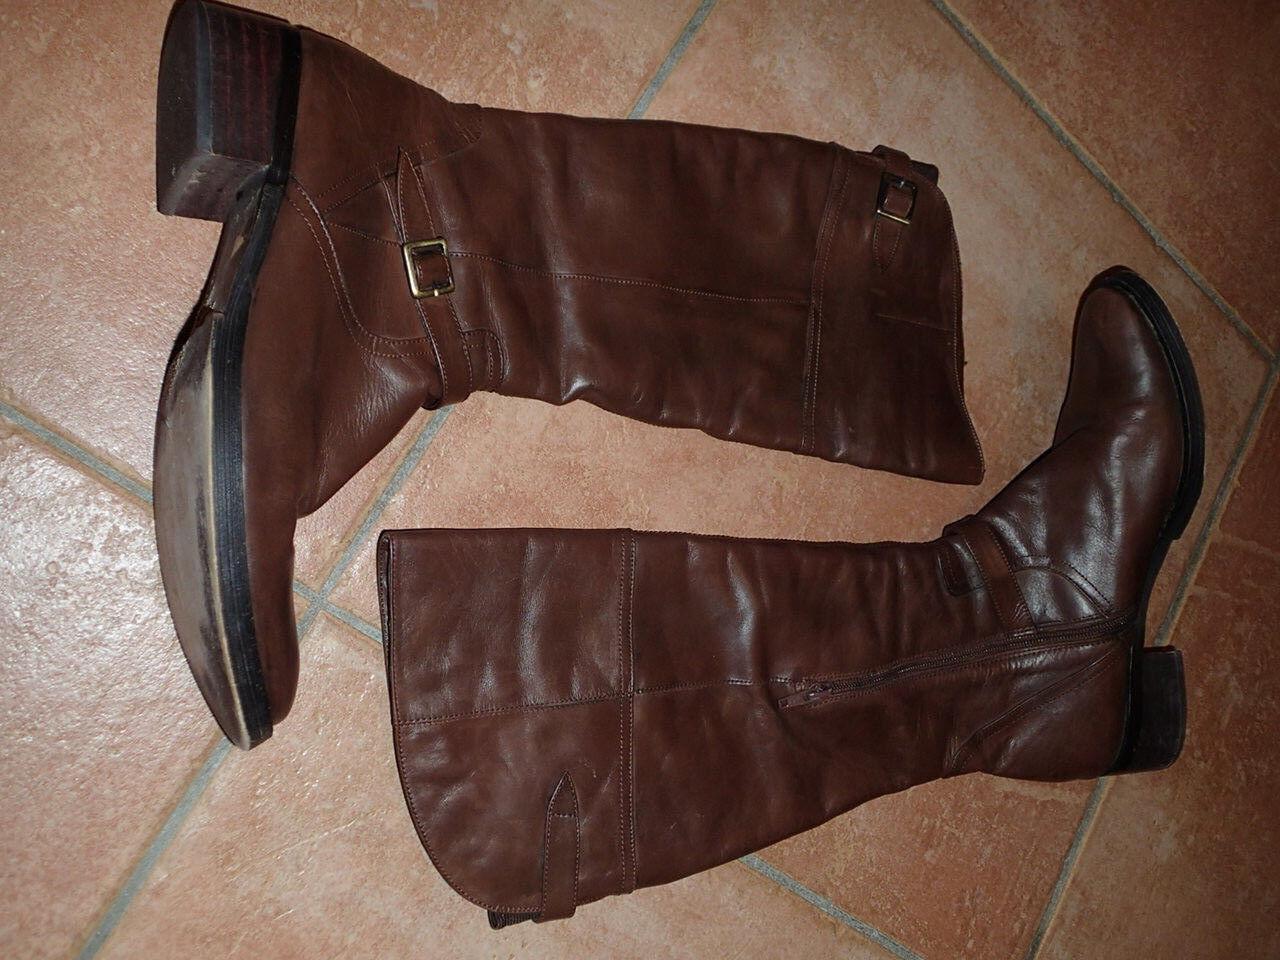 Gr. 38 original Italy Venezia Stiefel Lederstiefel Klassiker braun Cognac Leder